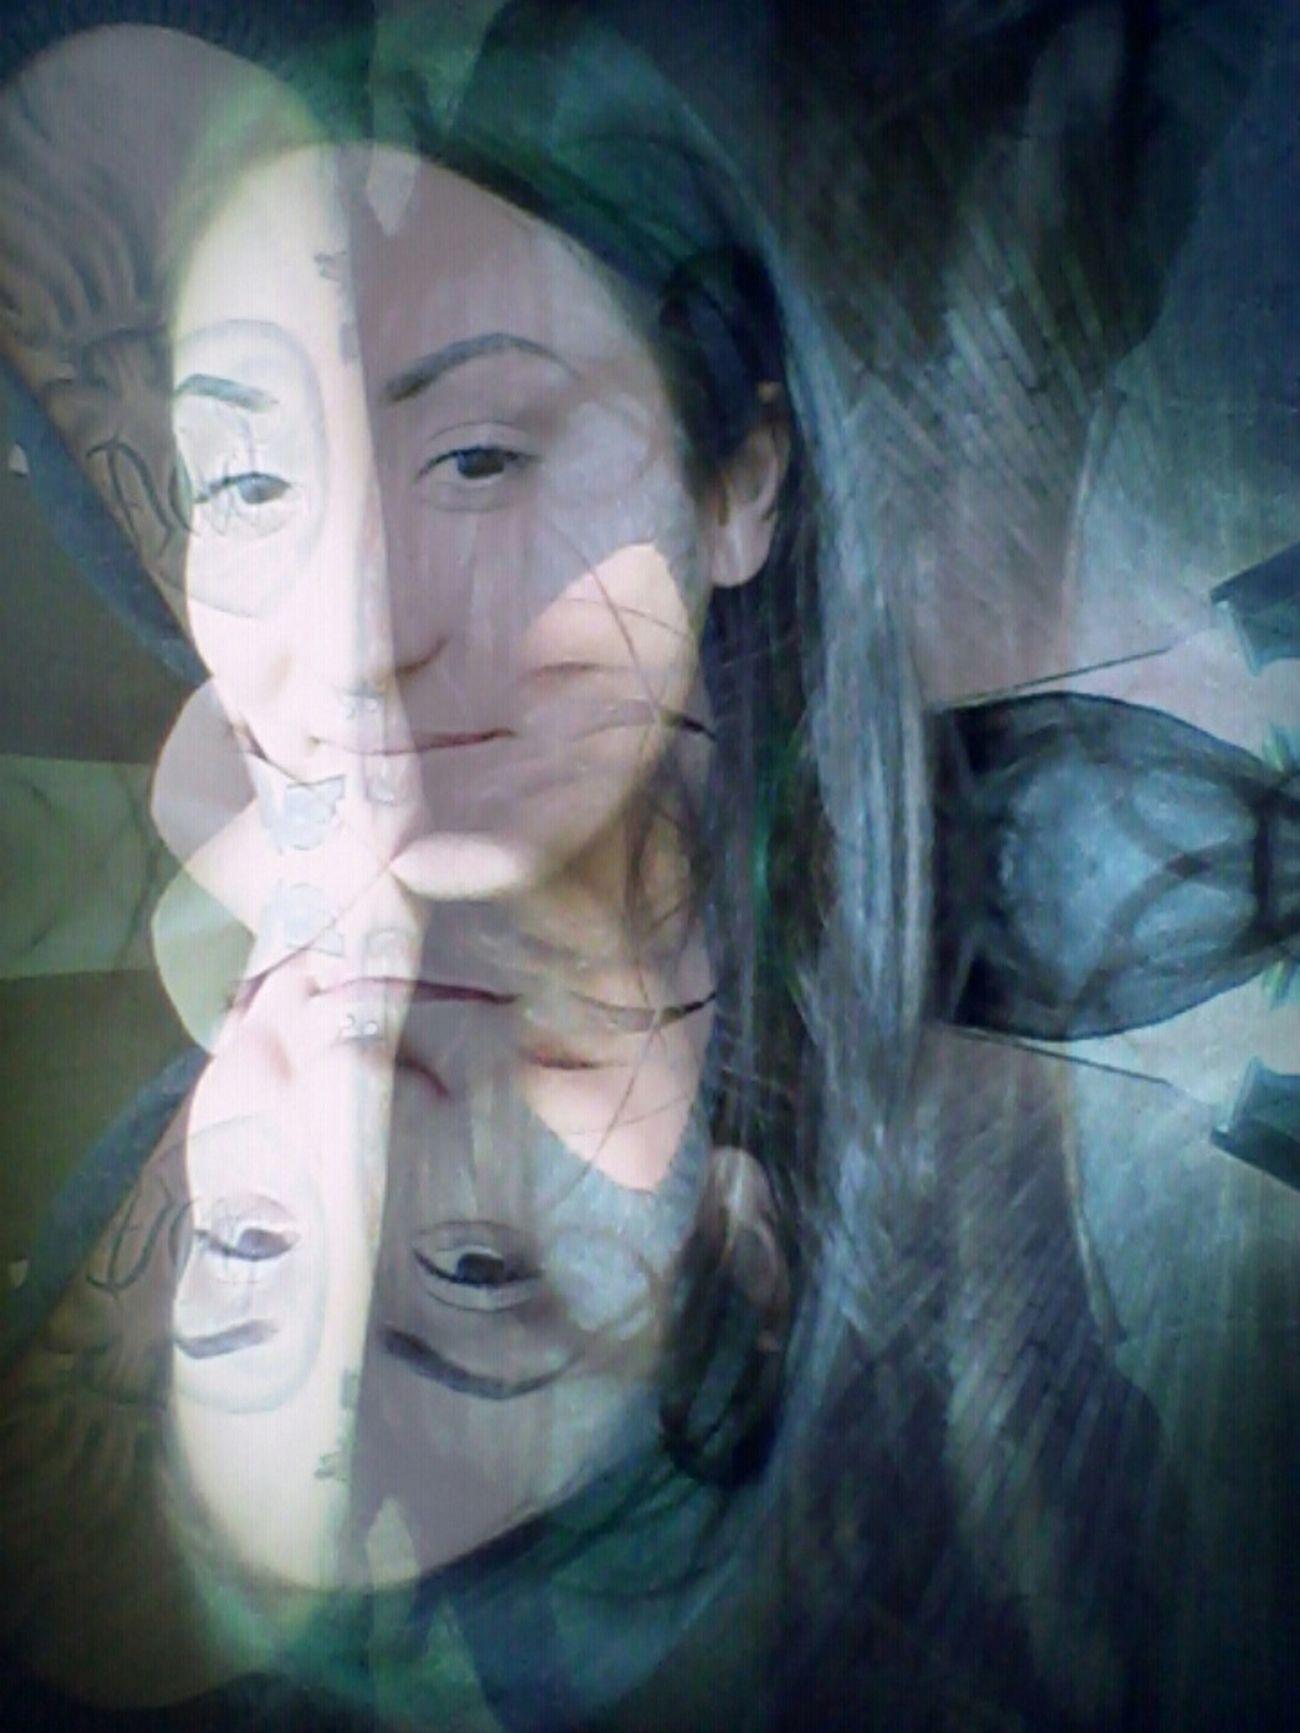 Accidental Art Acidental Photo Accidental Beauty Glitchshot Malfunction Camera Malfunction